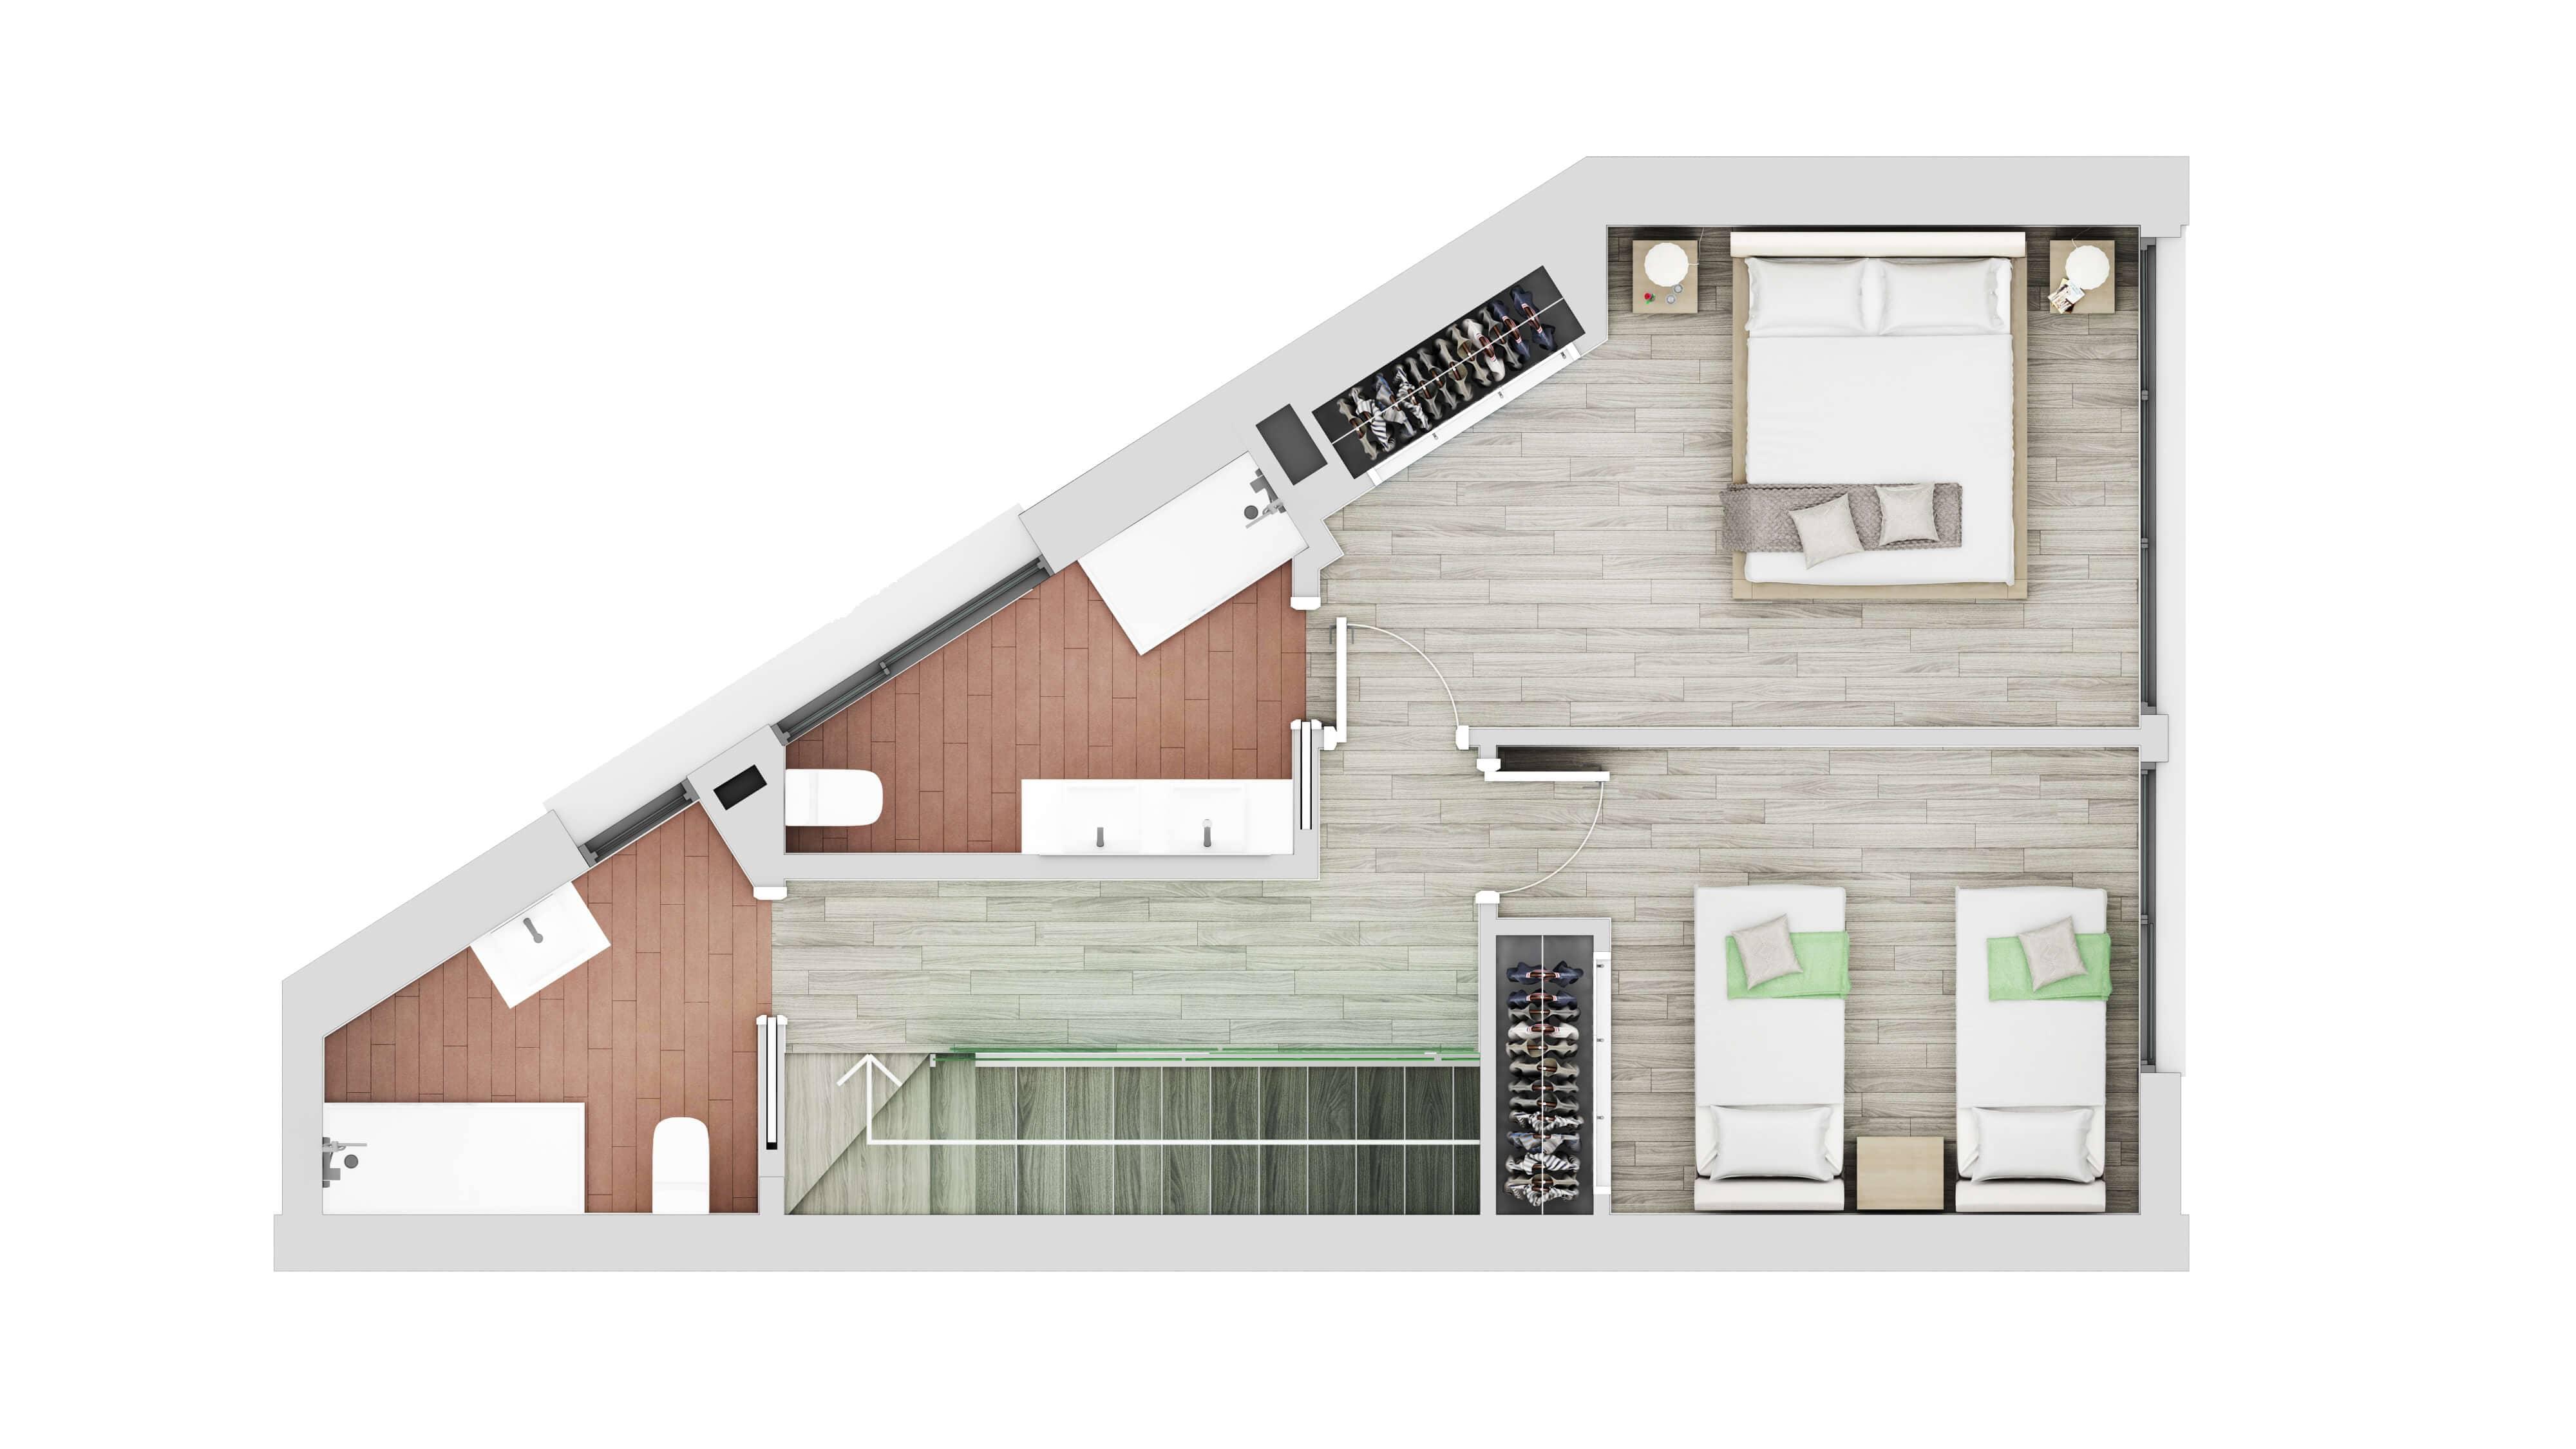 le mirage estepona cancelada huis te koop slaapkamers 2 verdieping